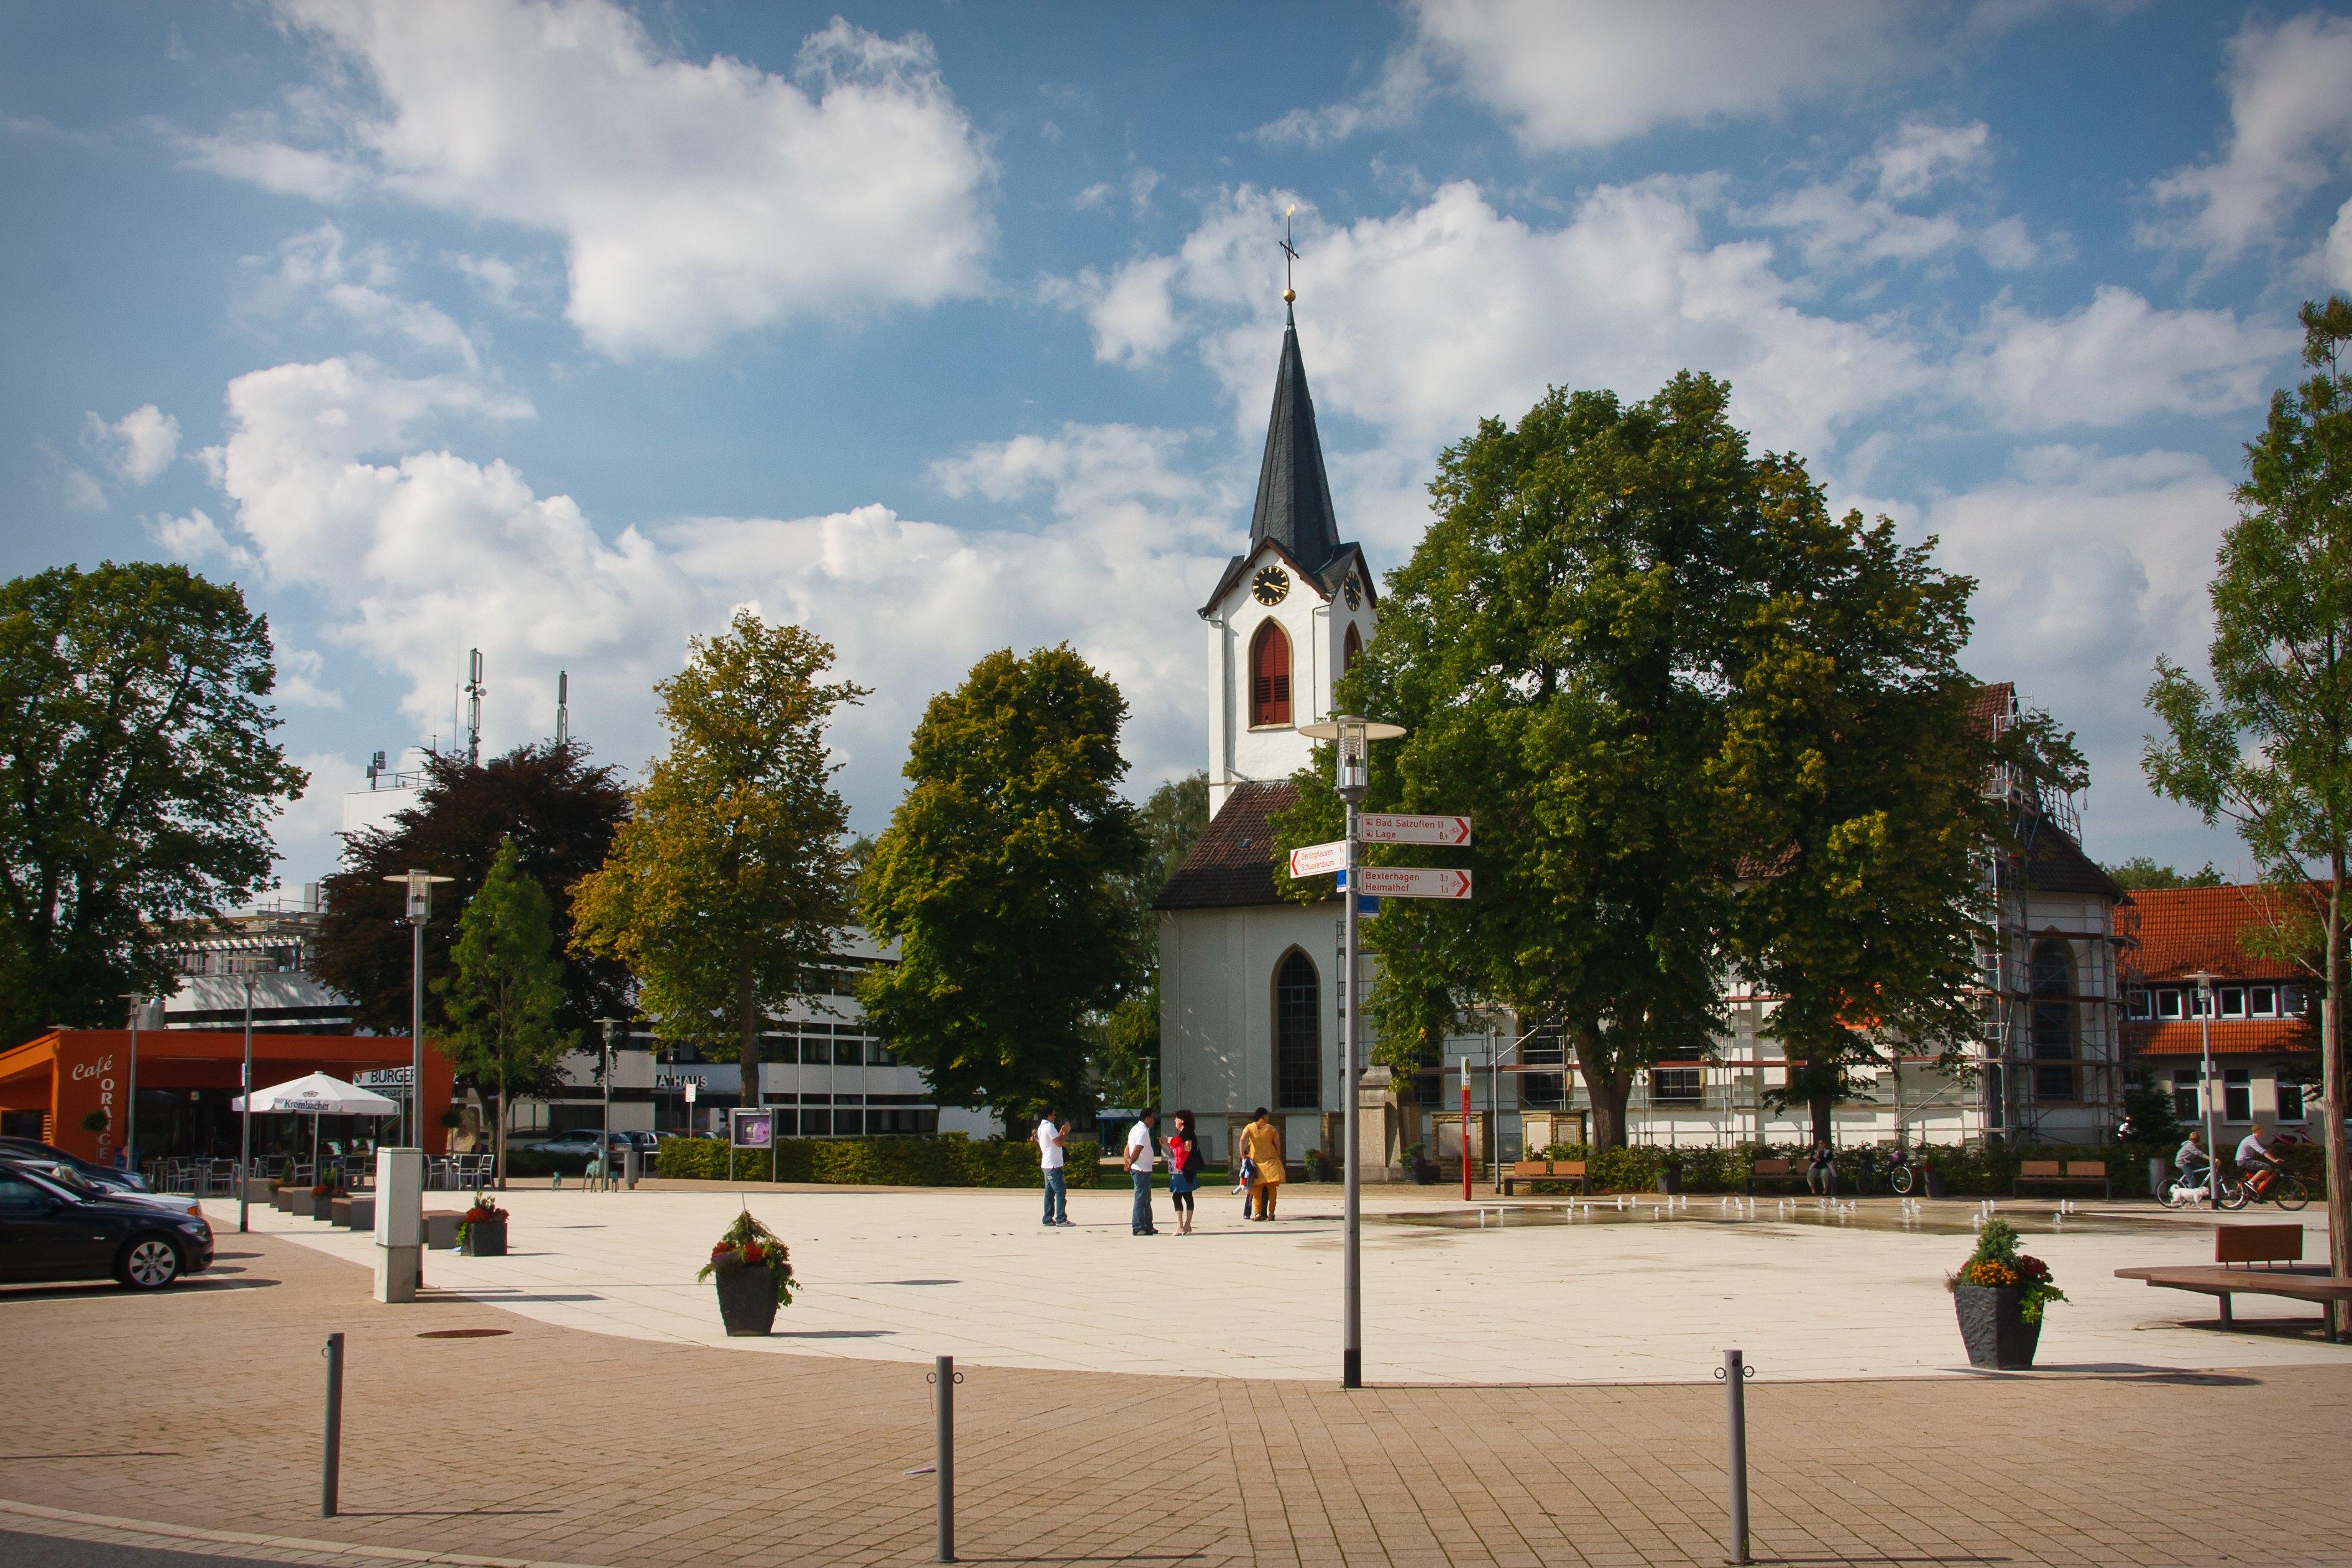 Martkplatz Leopoldshöhe